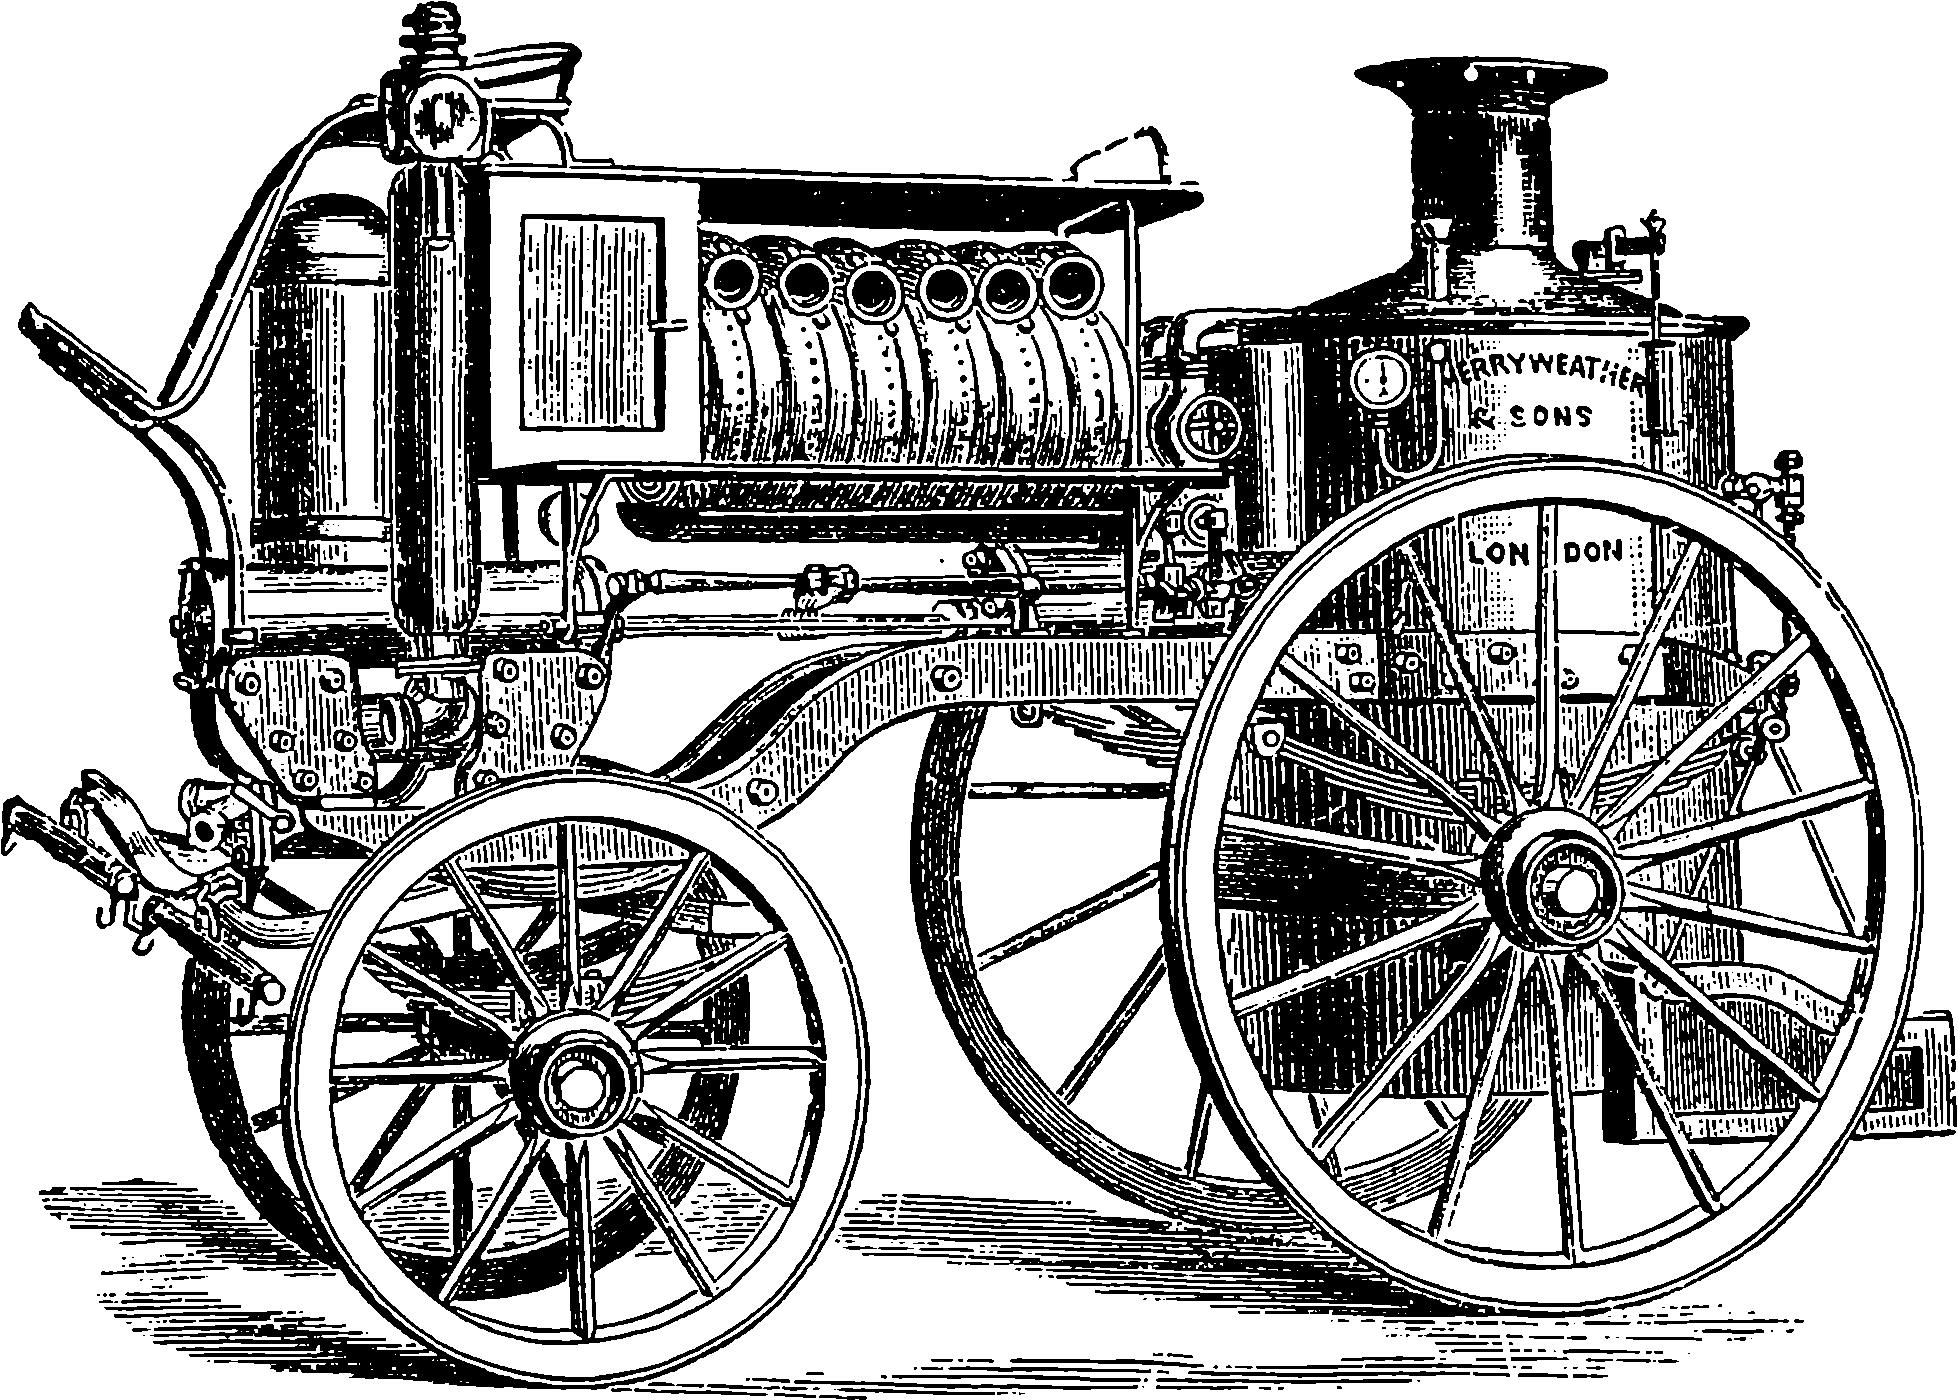 Fig 14 merryweather's steam fire engine